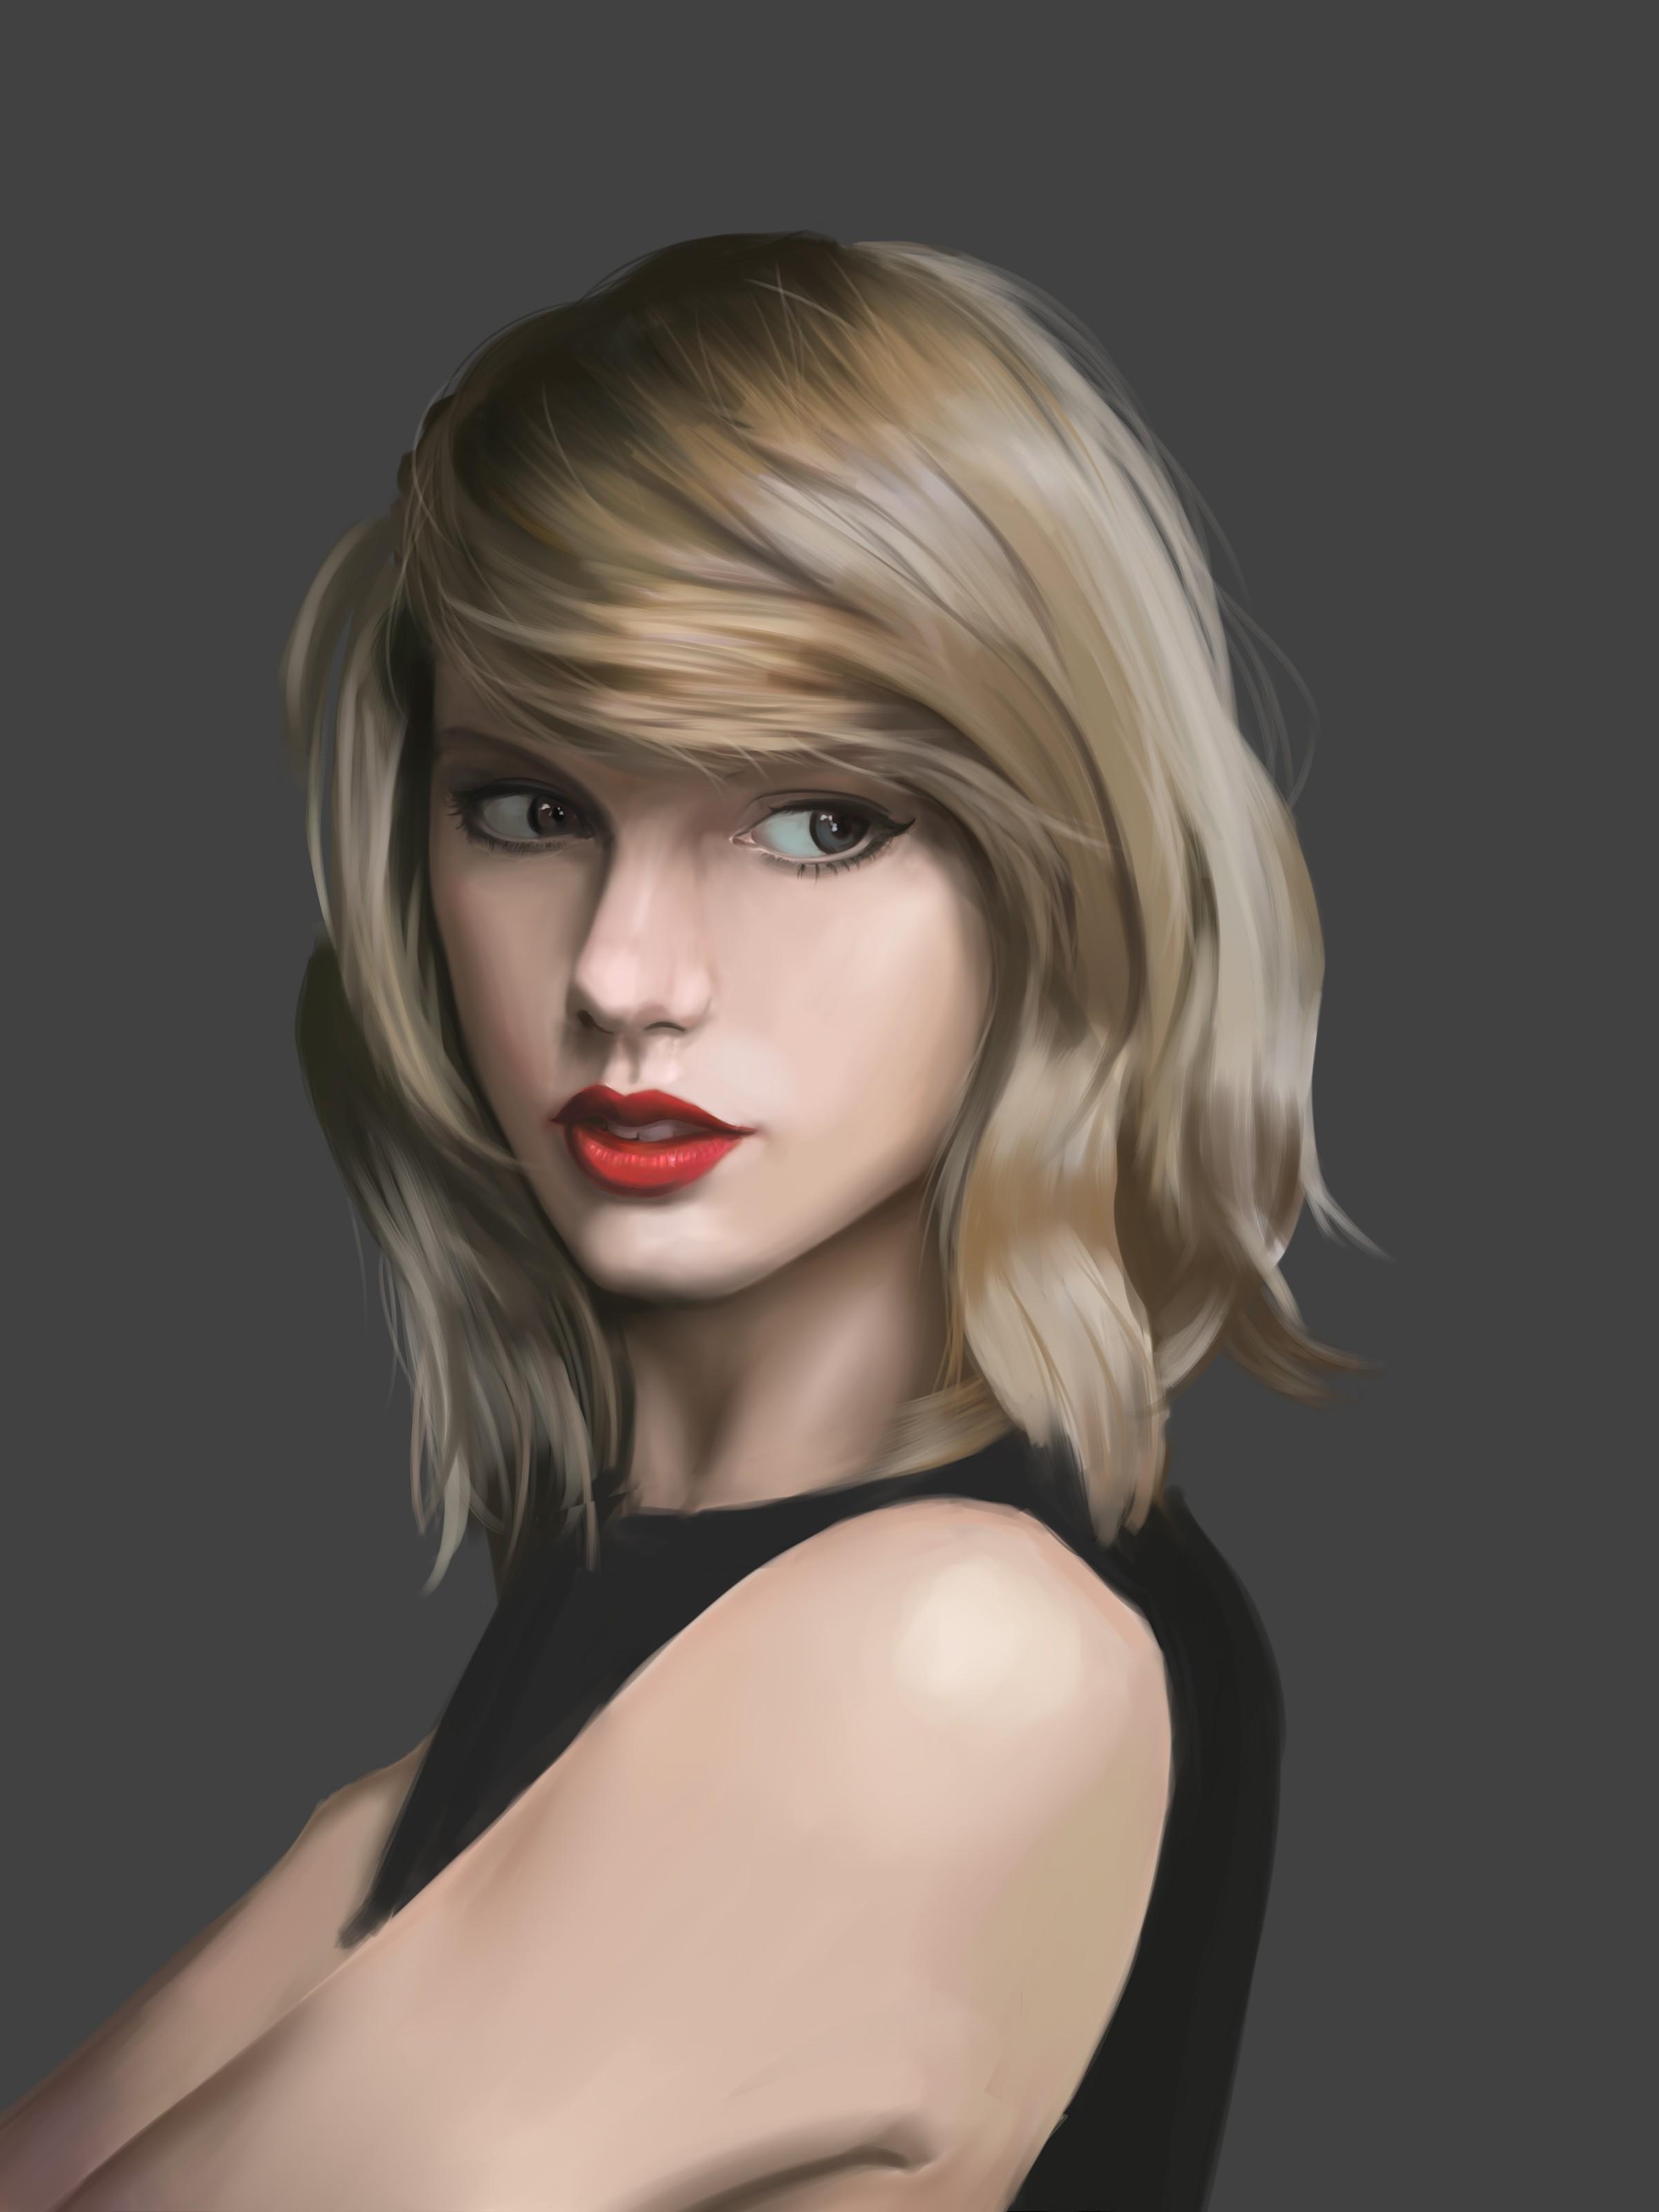 Wallpaper Face Blonde Long Hair Short Hair Black Hair Taylor